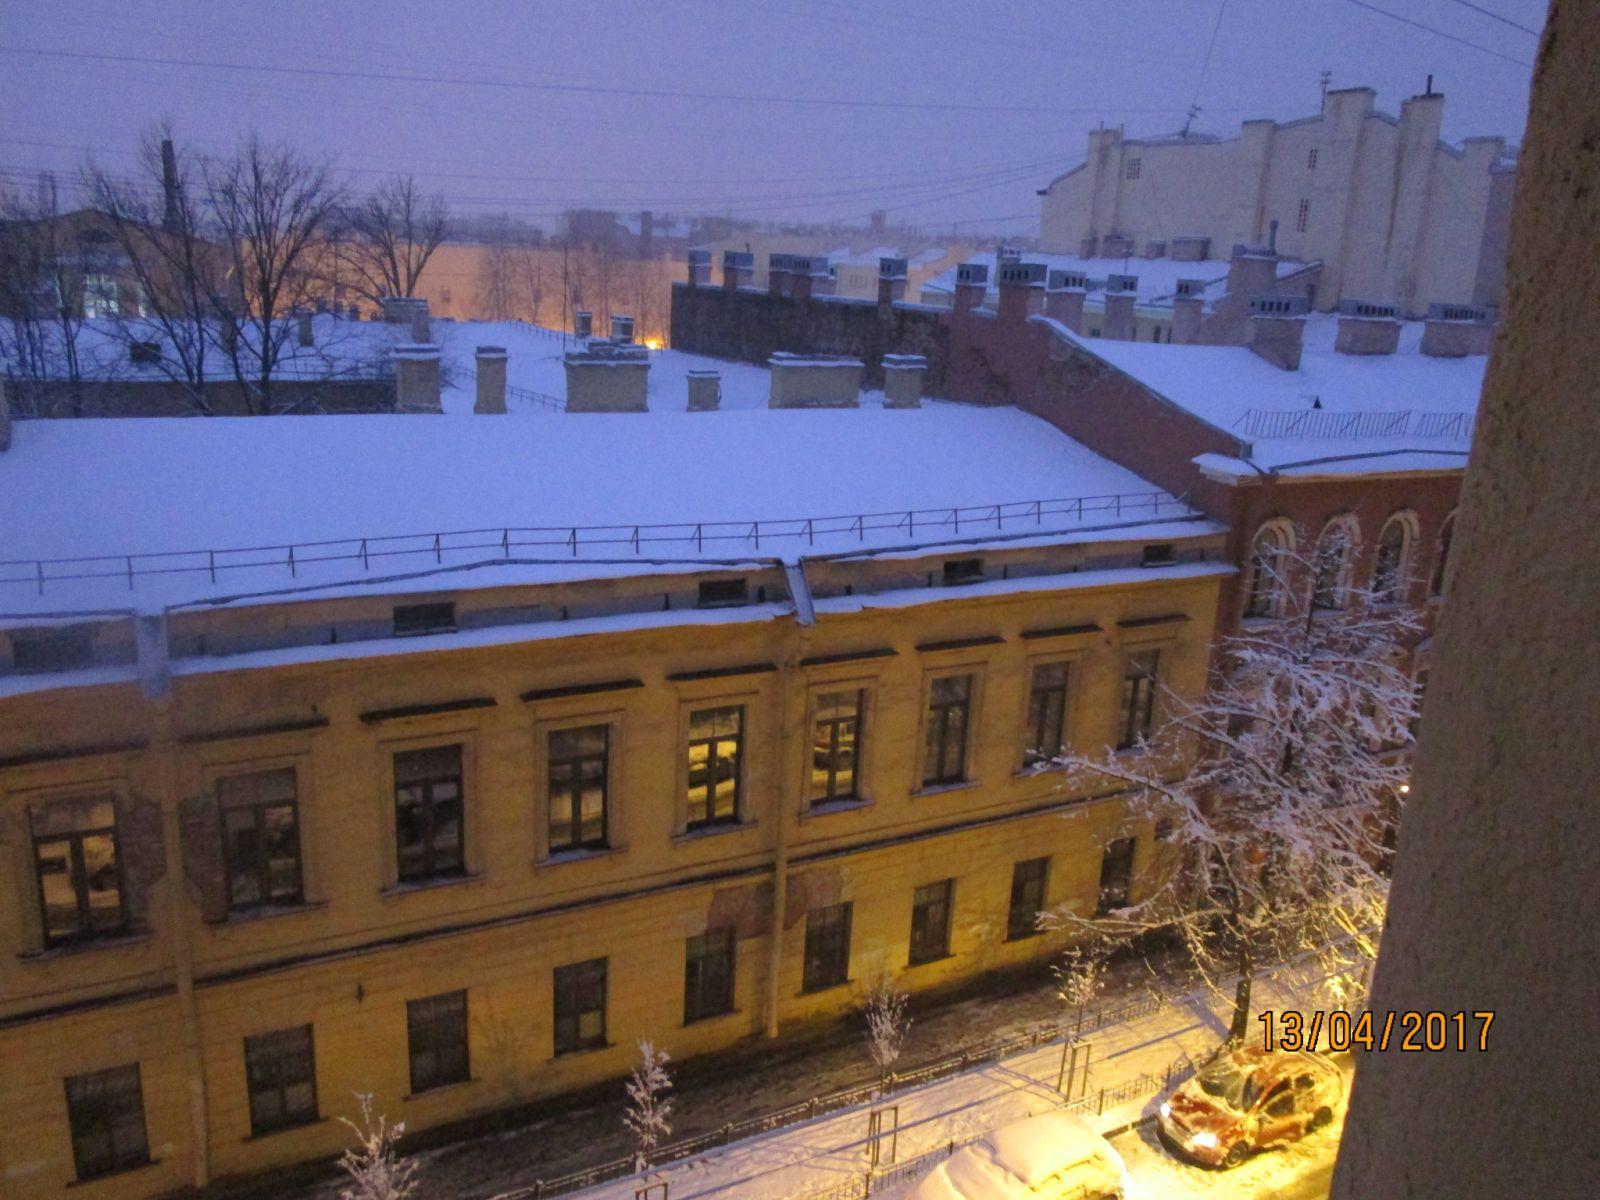 17.04.13 Питер в снегу